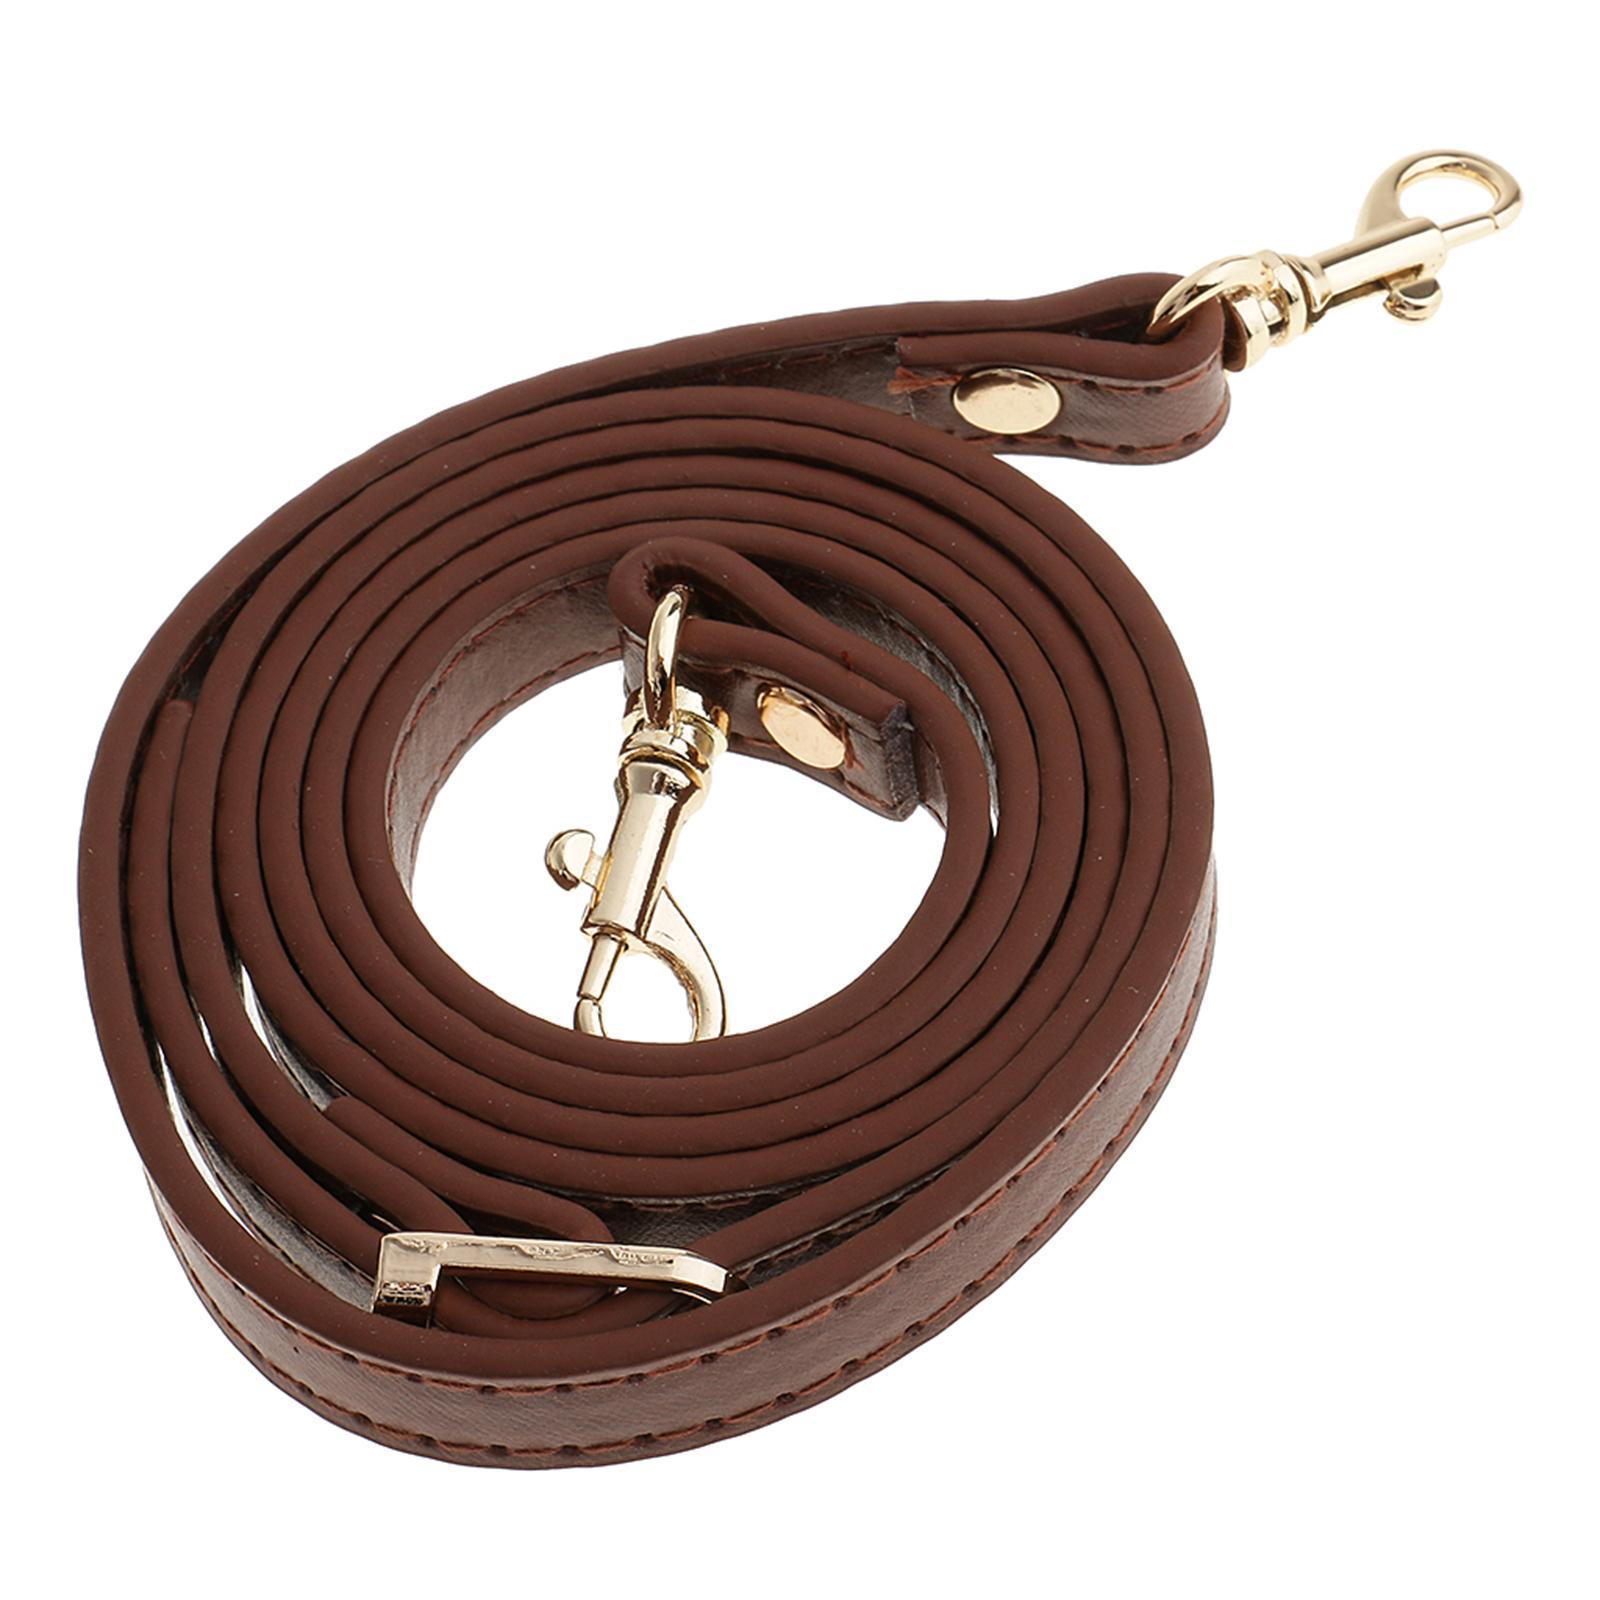 120cm-Bag-Leather-Strap-Replacement-Shoulder-Bags-Handle-Crossbody-Strap thumbnail 10